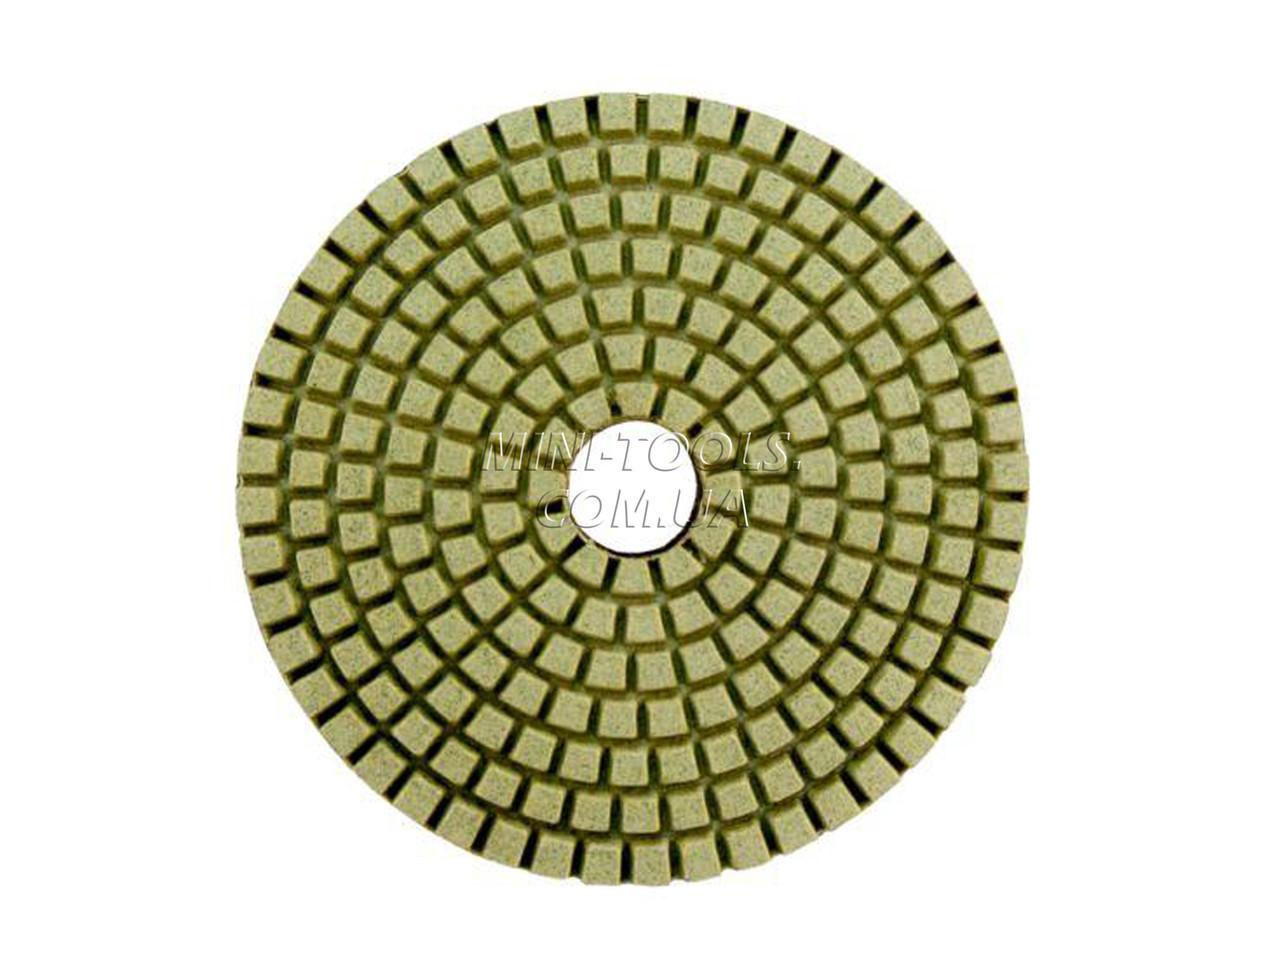 Черепашка D-125мм. зерно #400. Алмазний гнучкий шліфувальний круг YDS Tools